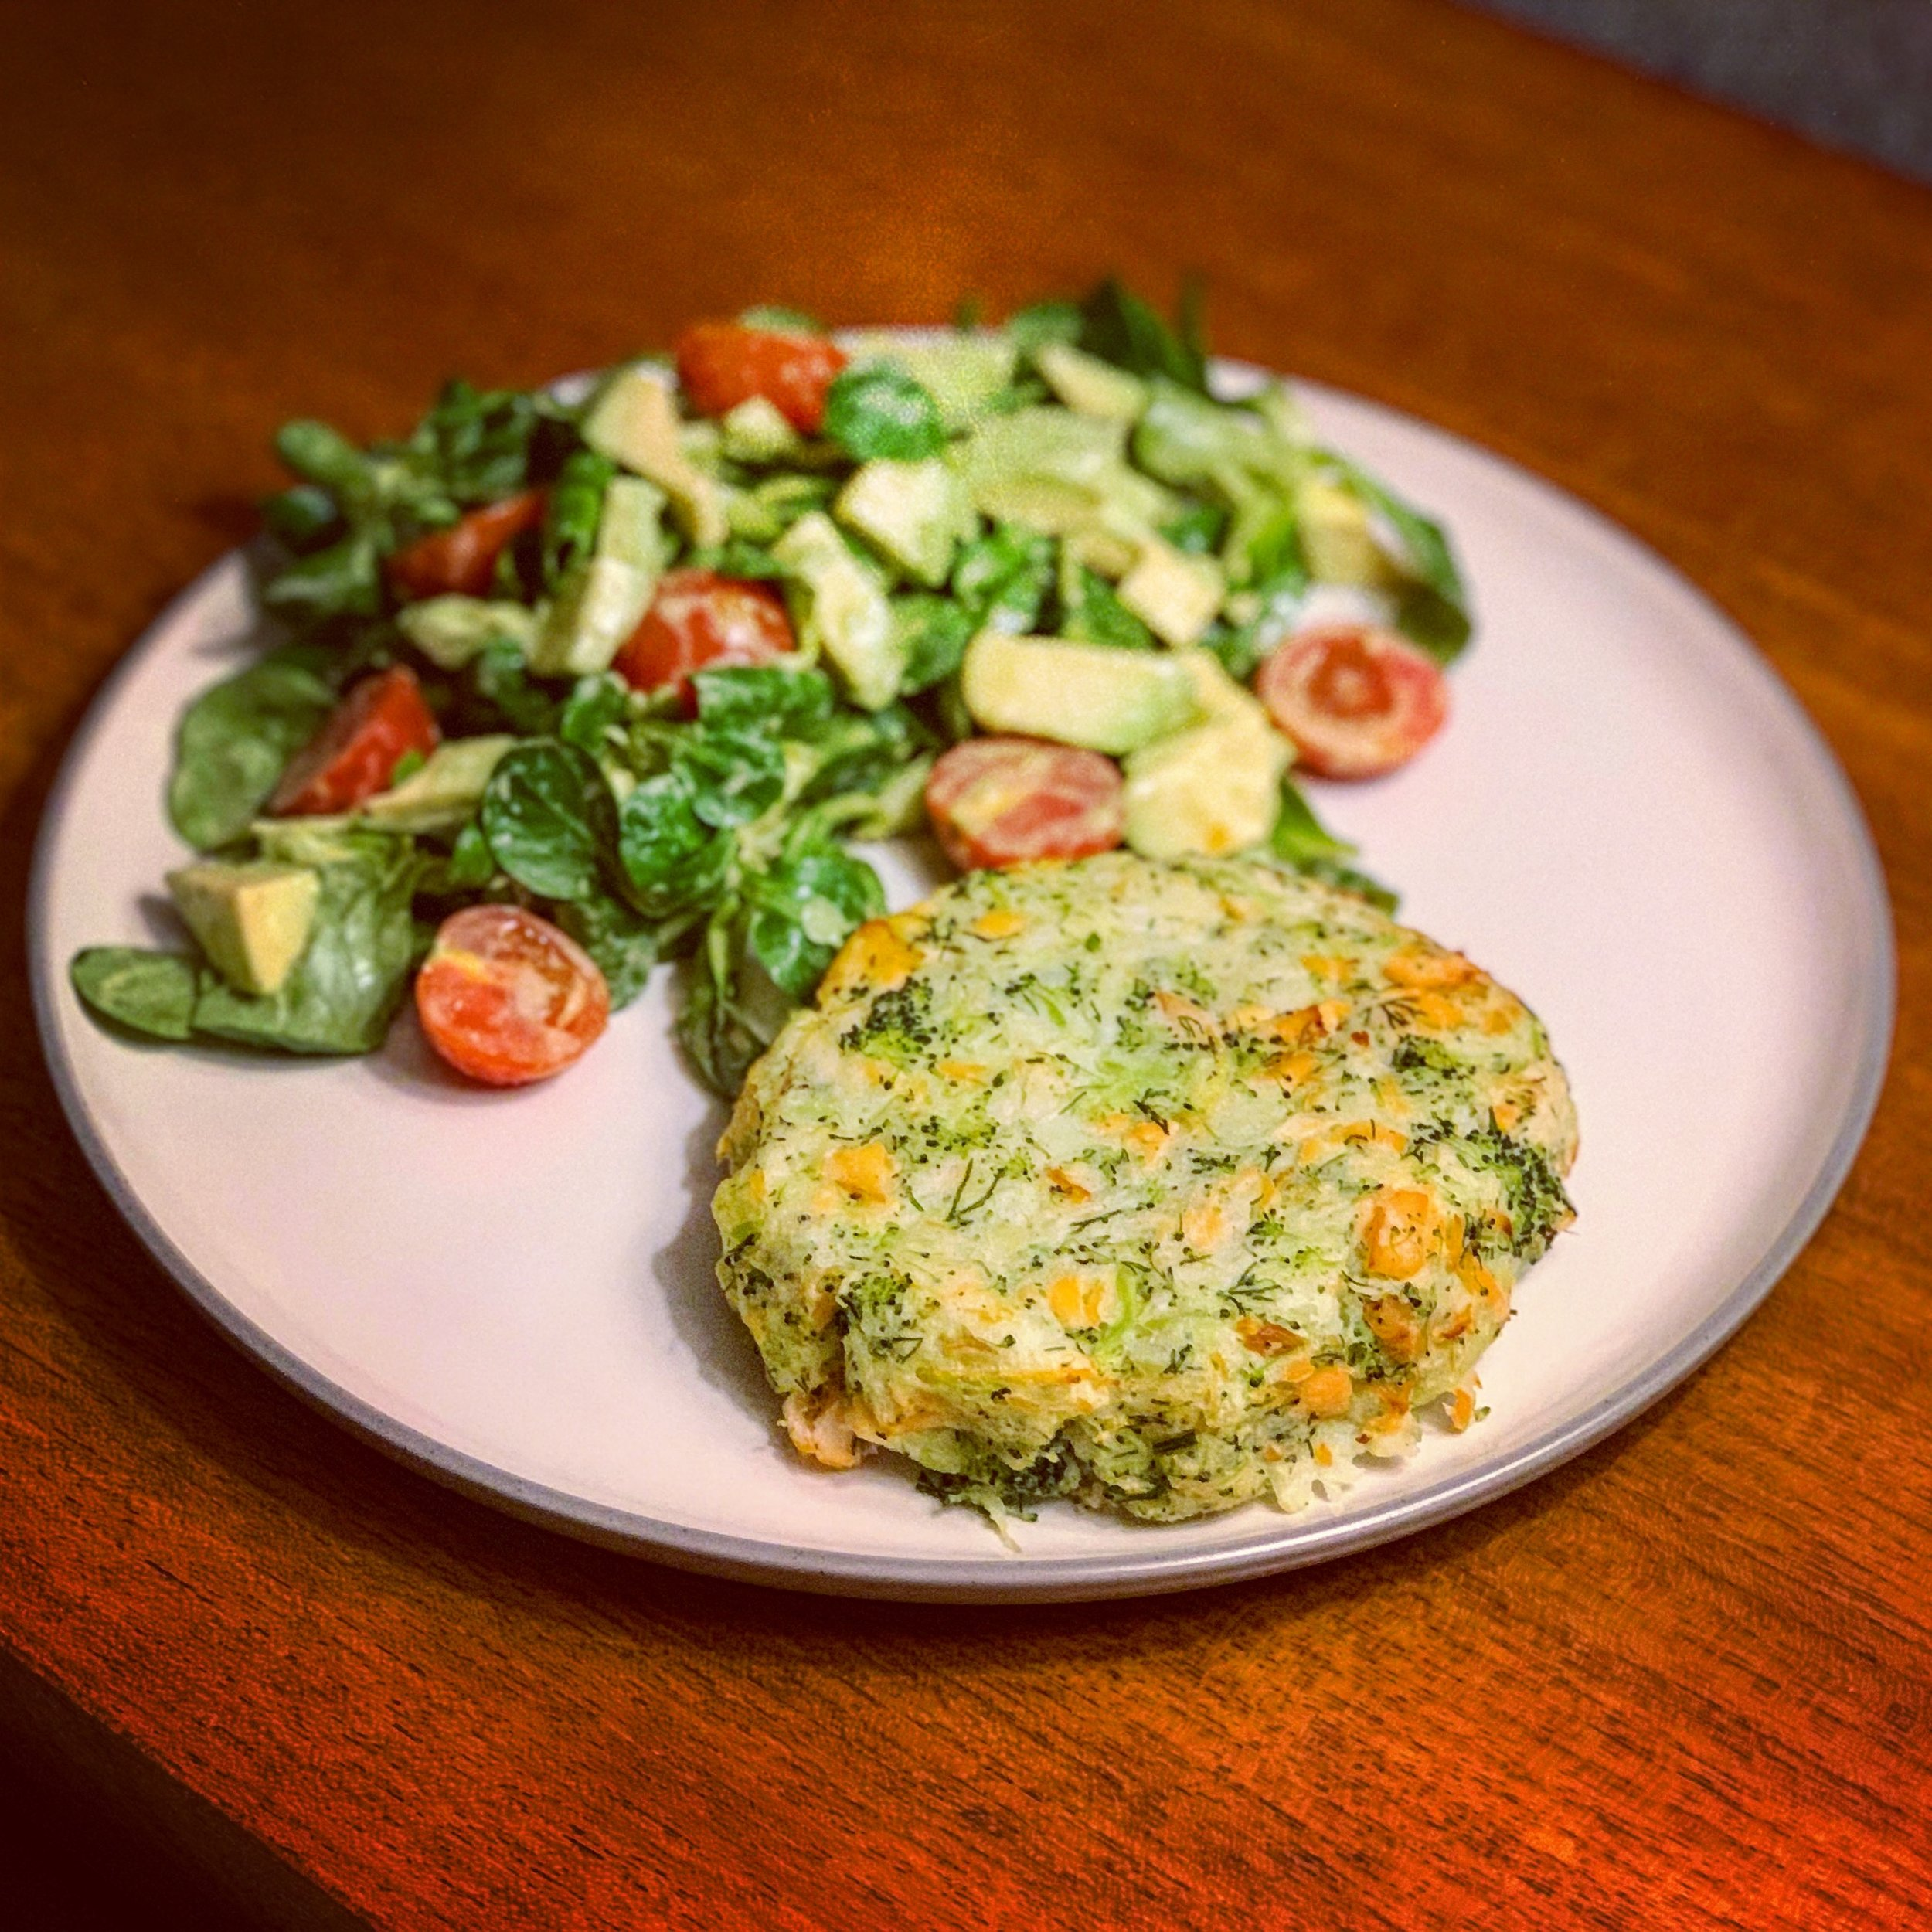 Salmon and Broccoli Cakes